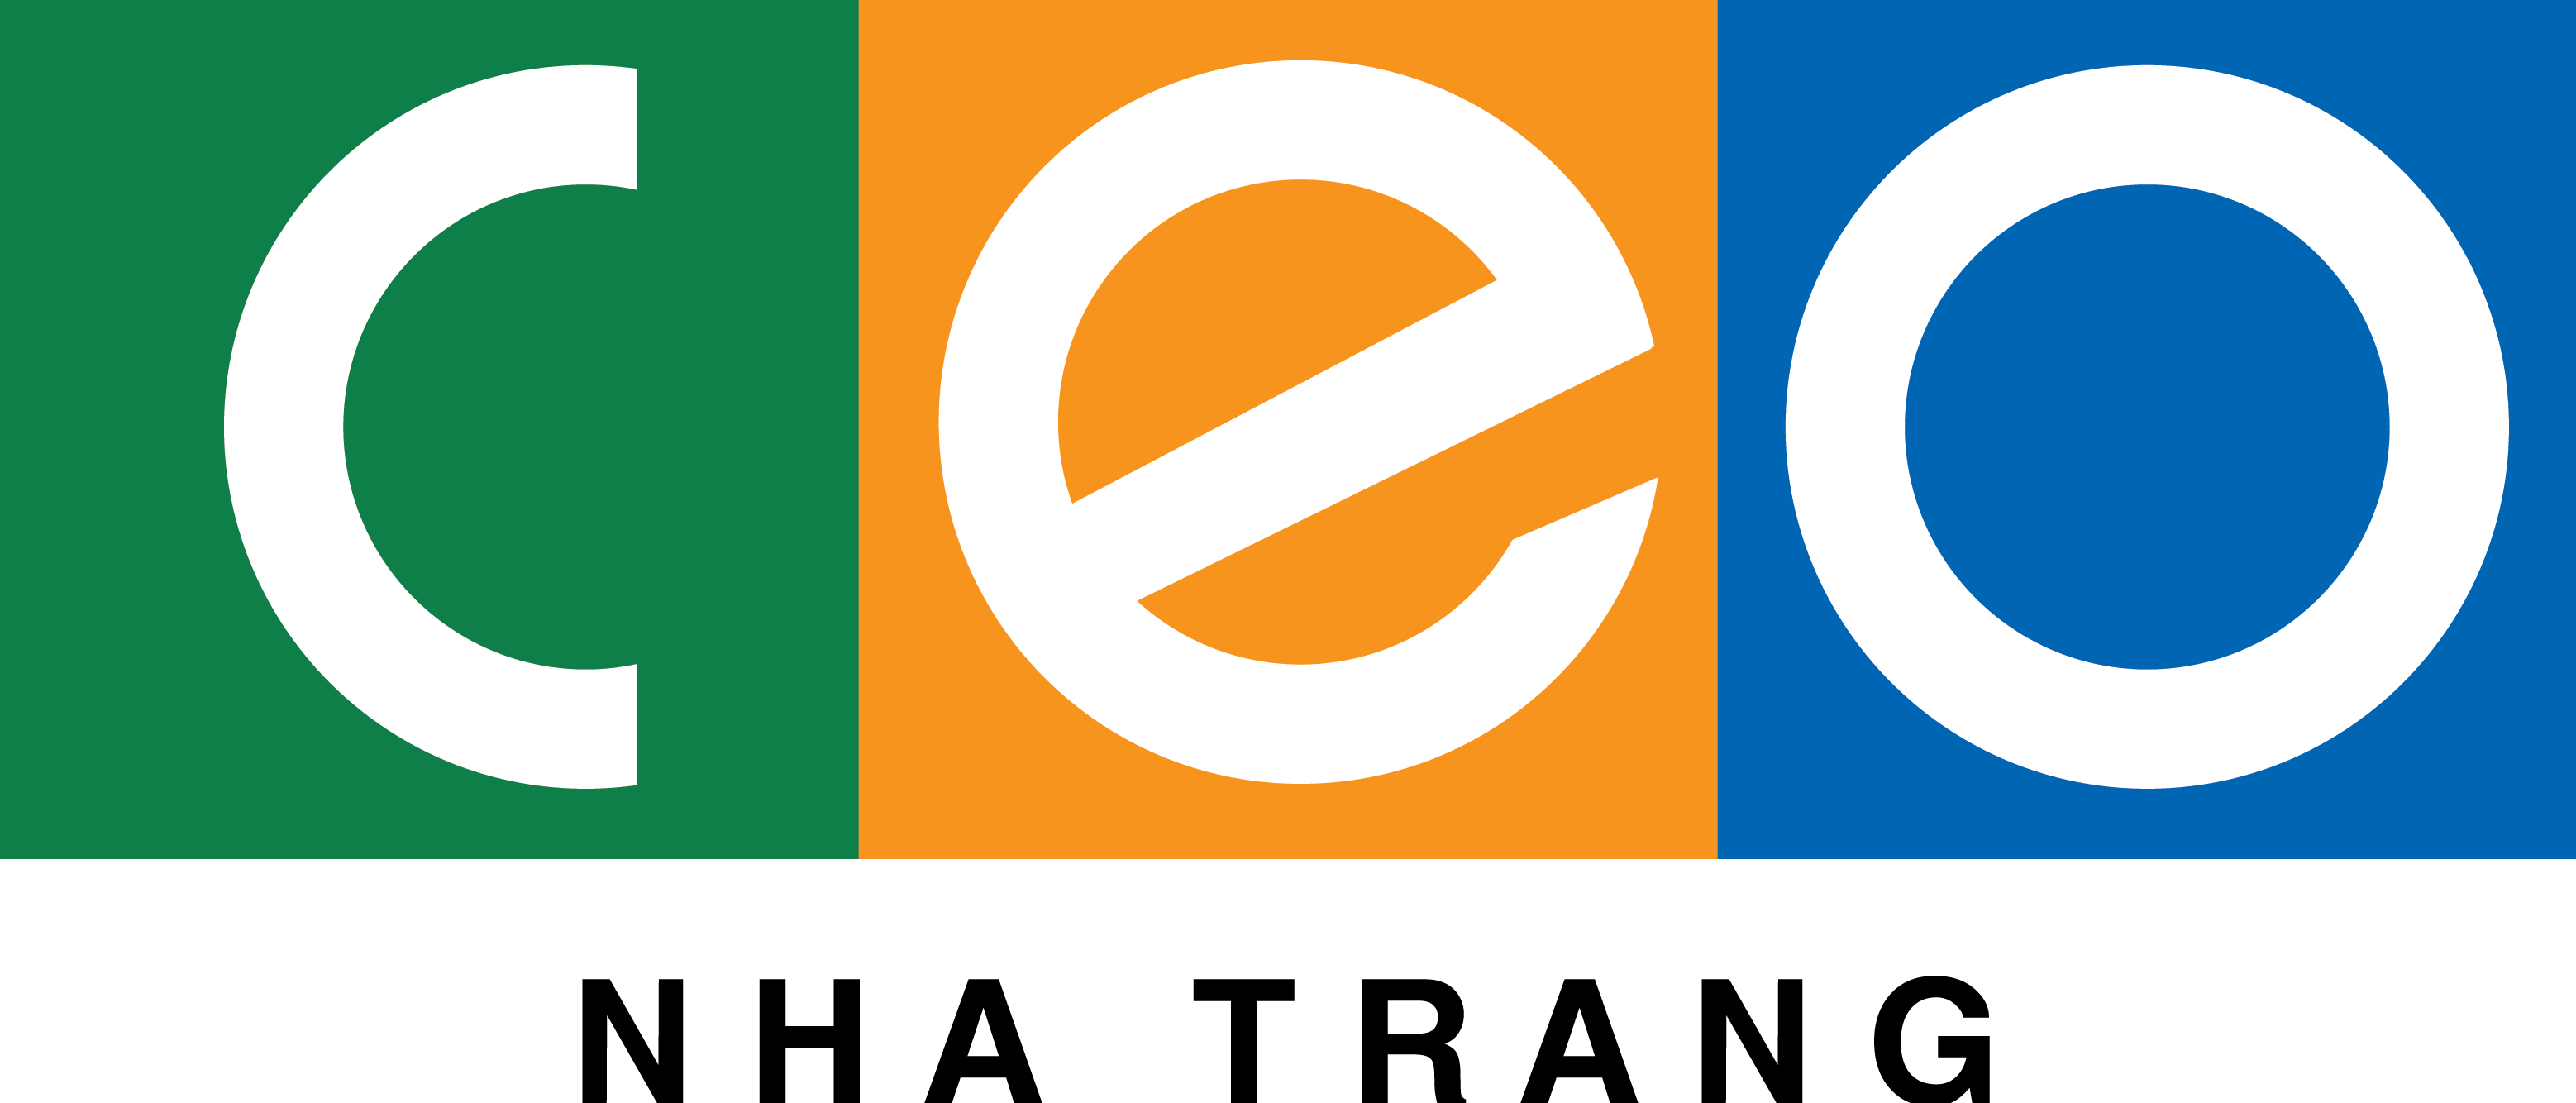 logo CEO Nha Trang - Tập đoàn CEO